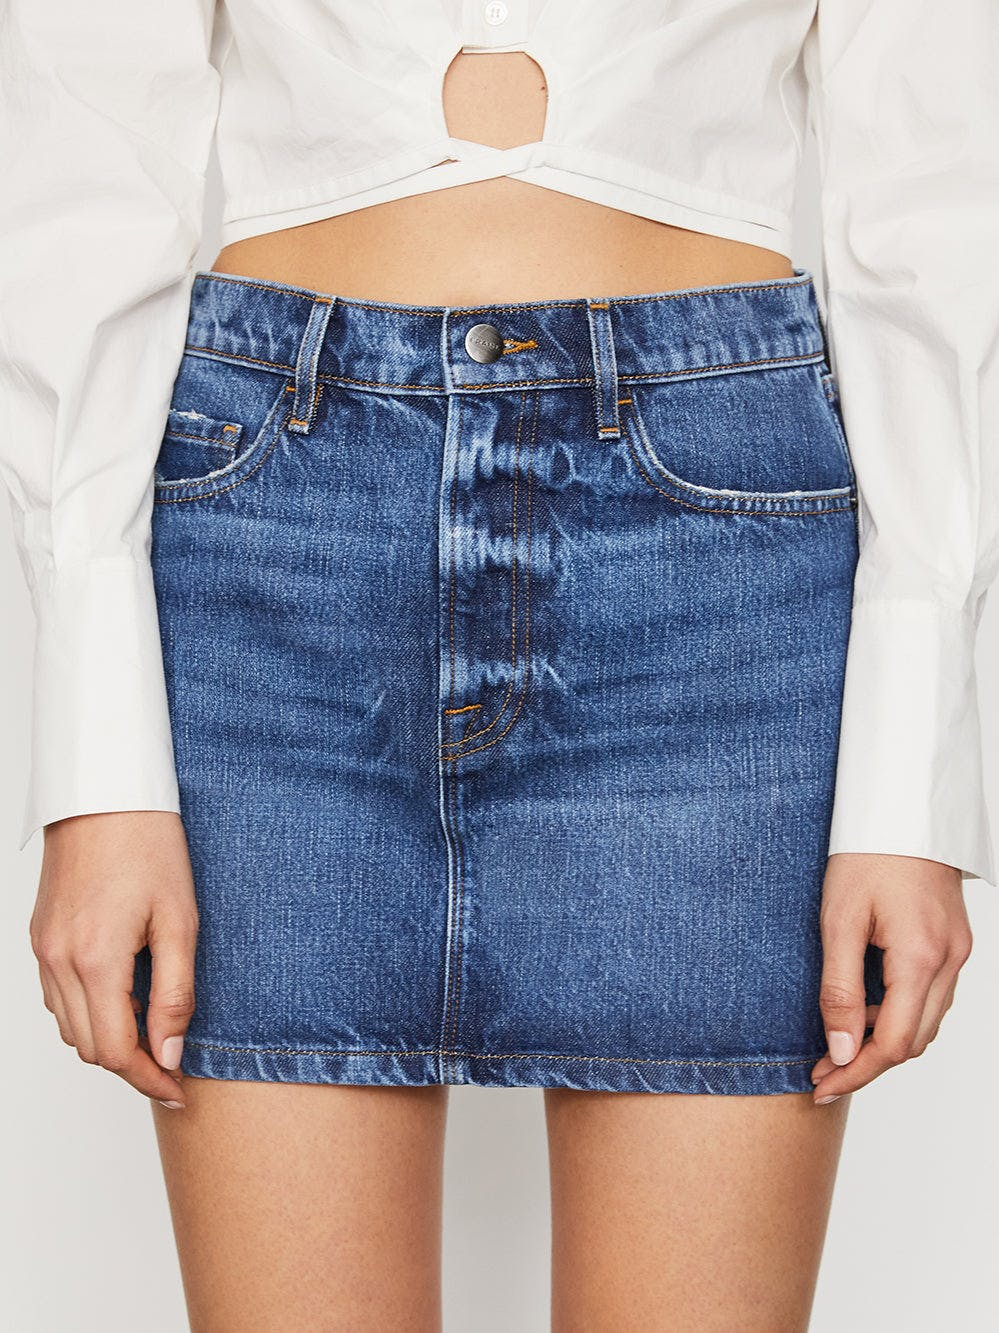 skirt detail view